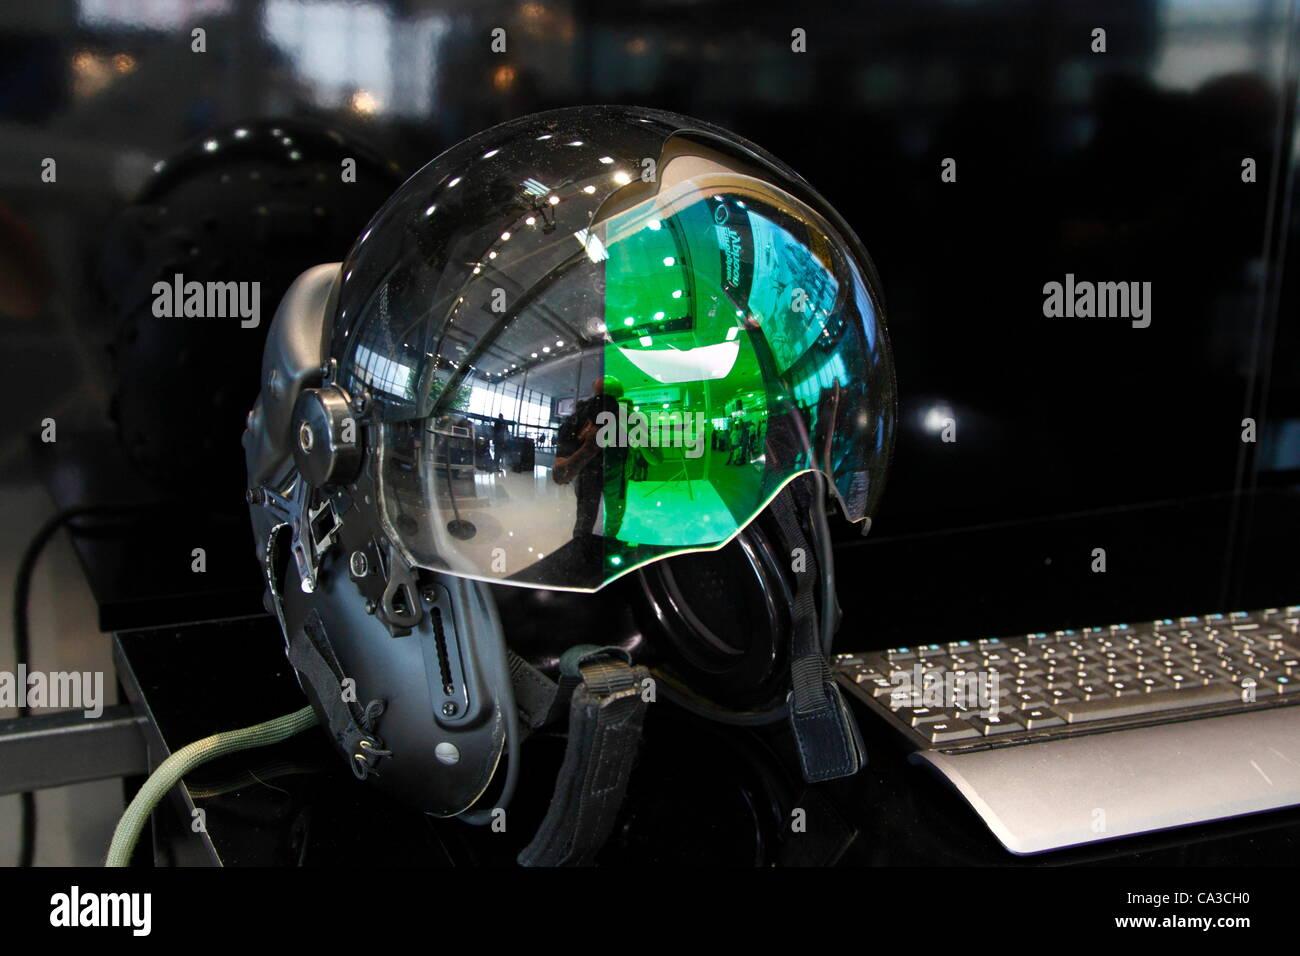 high-tech-helmet-used-by-the-eurofighter-typhoon-pilots-the-helmet-CA3CH0.jpg